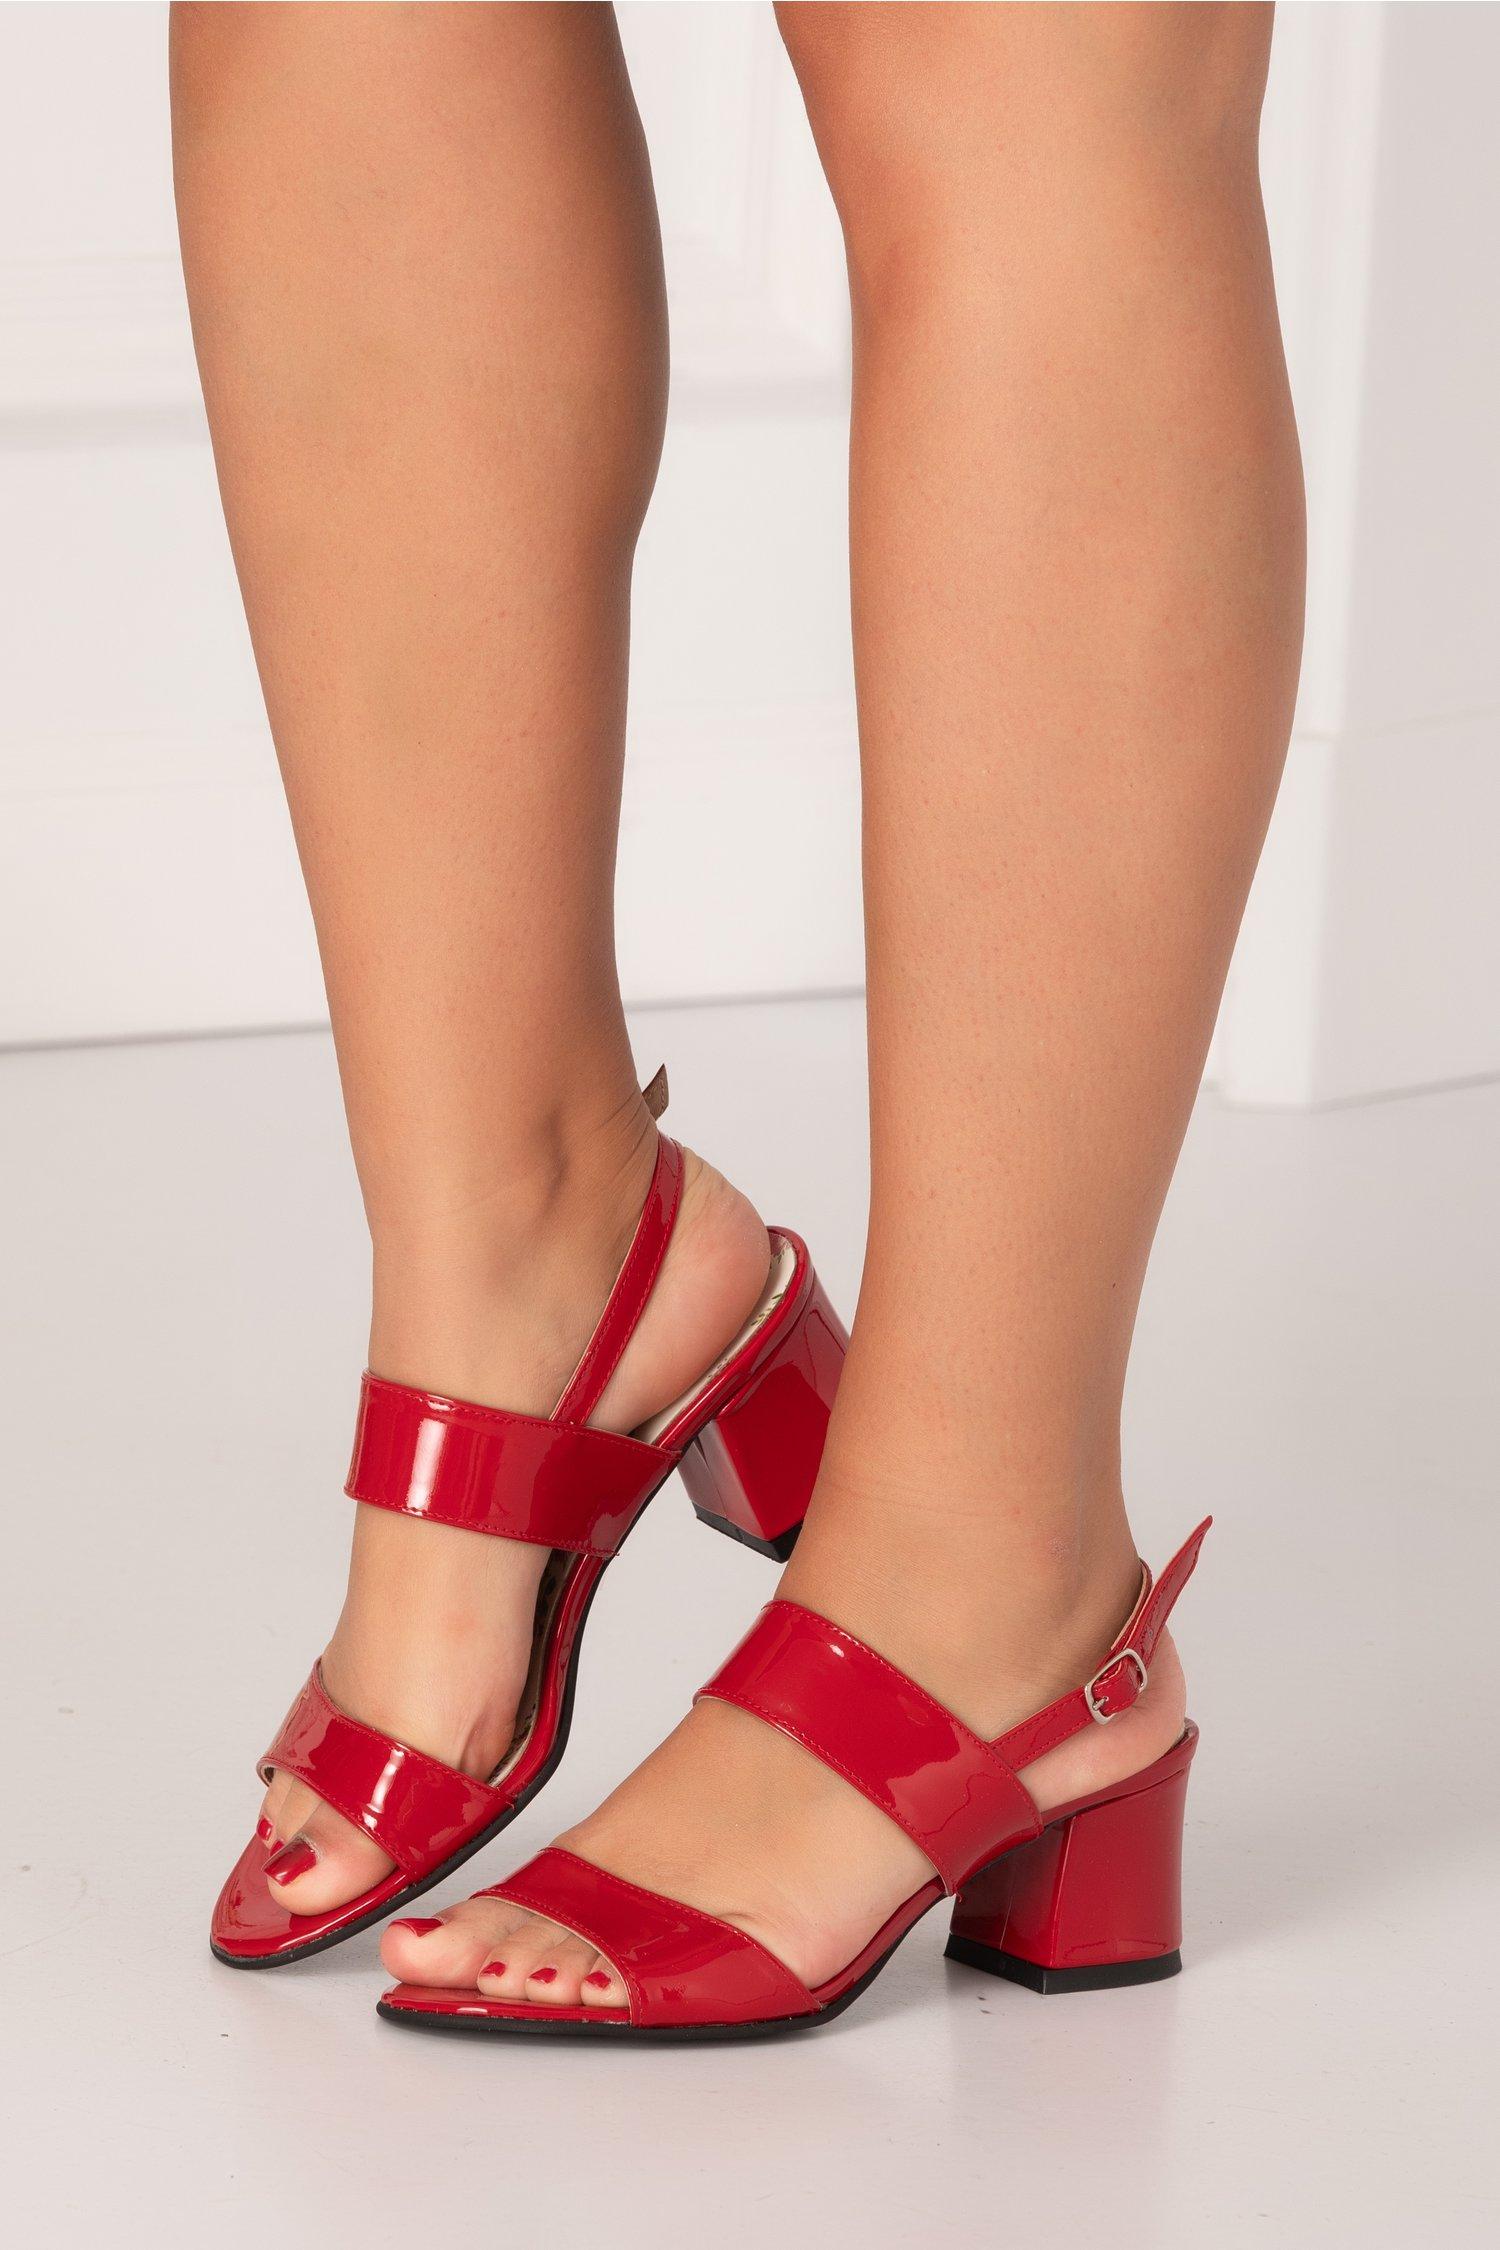 Sandale rosii lacuite cu tocul jos